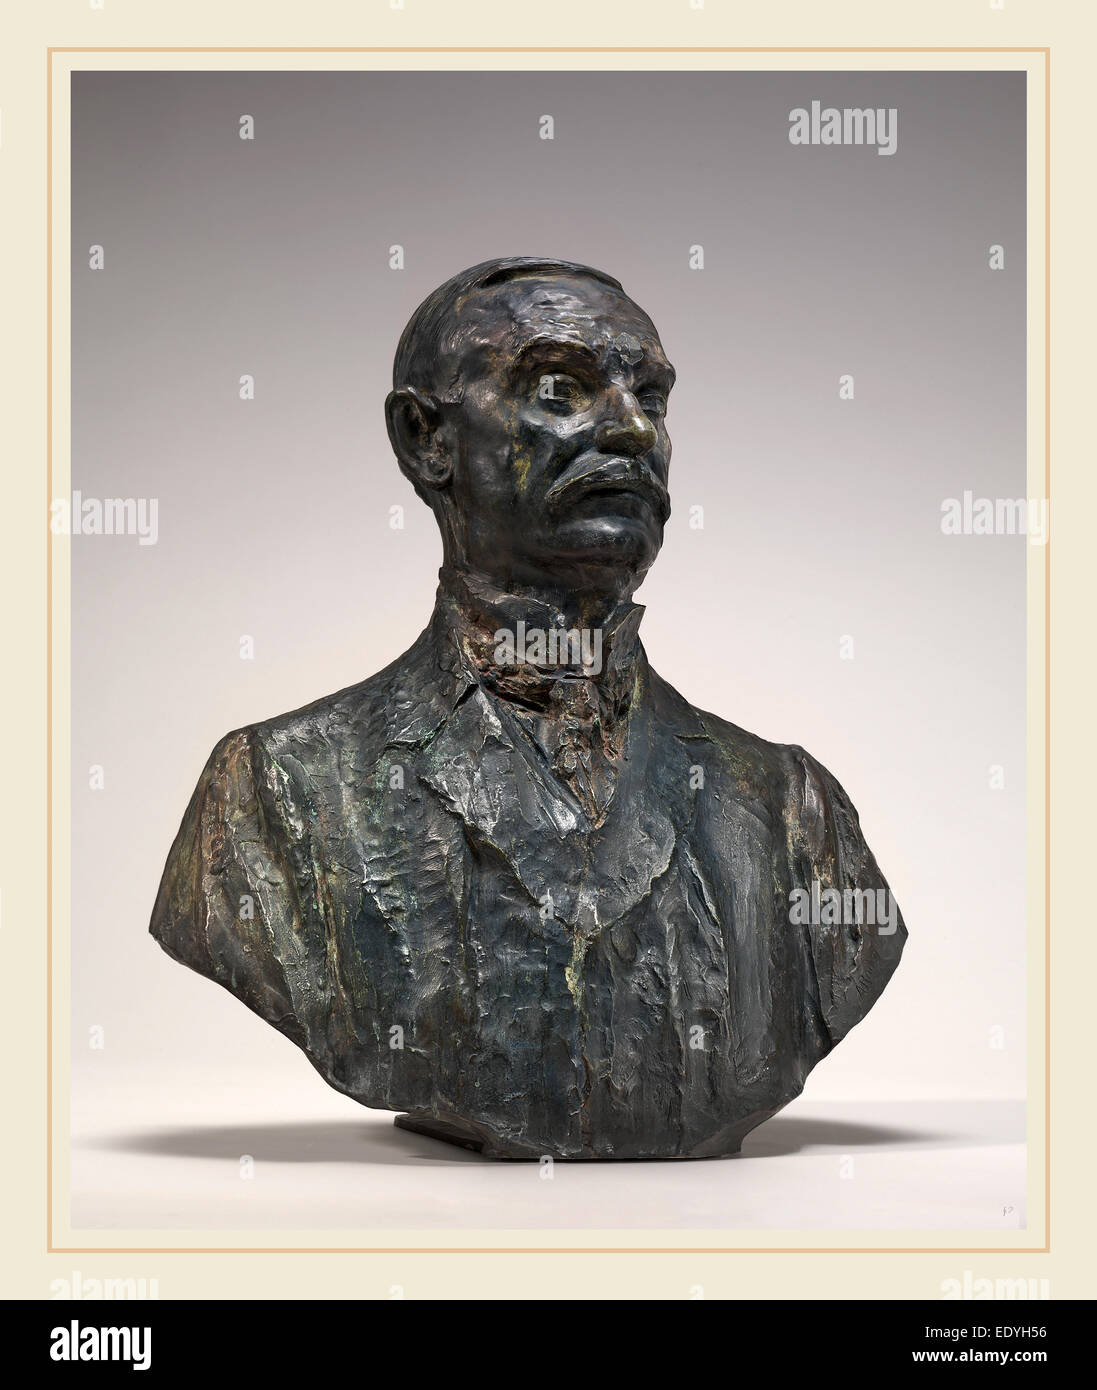 Auguste Rodin, Thomas Fortune Ryan, French, 1840-1917, 1909-1910, bronze - Stock Image